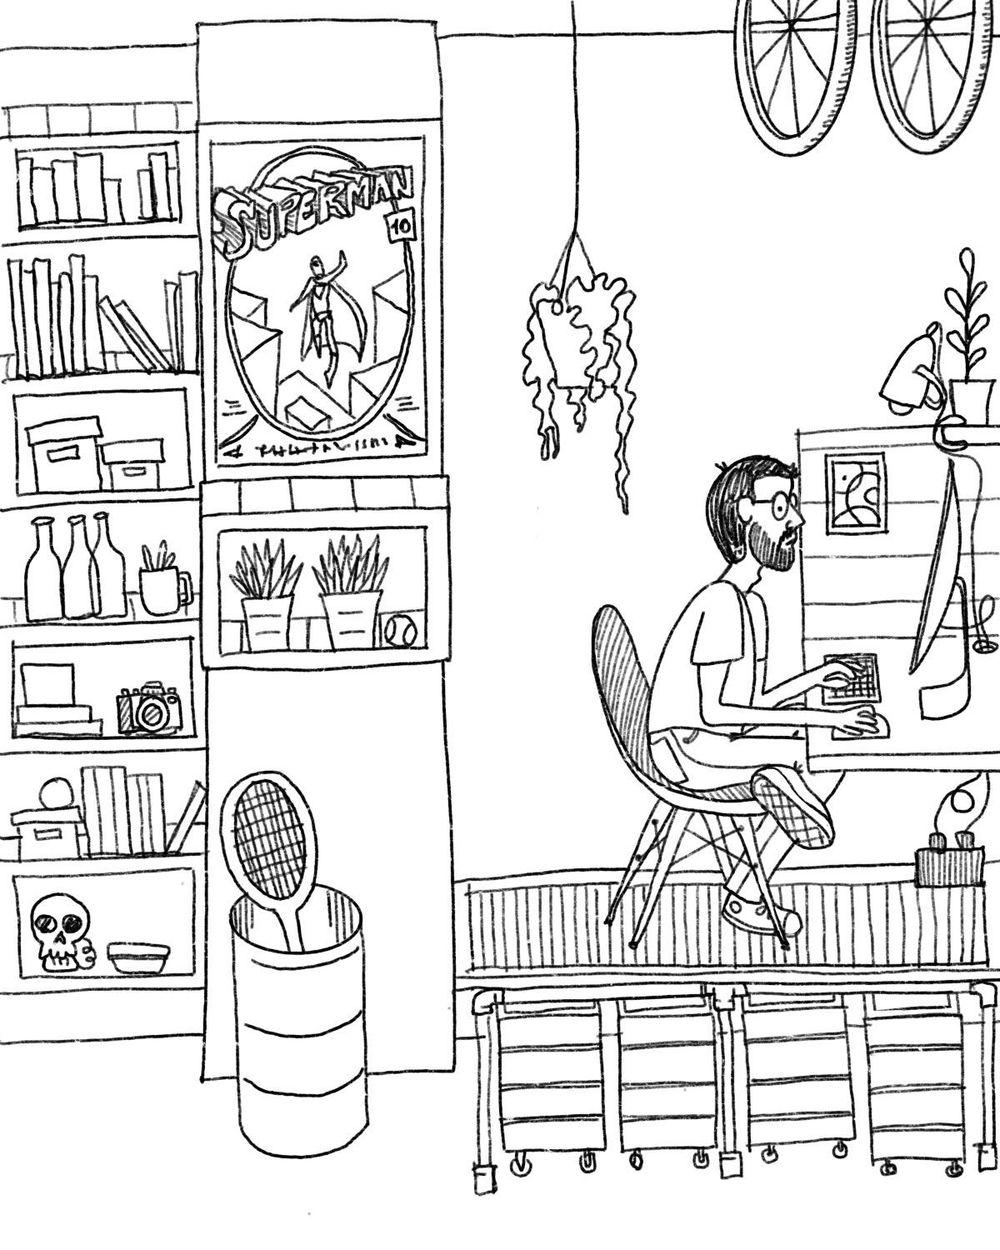 My workspace. Sebasandrade - image 4 - student project